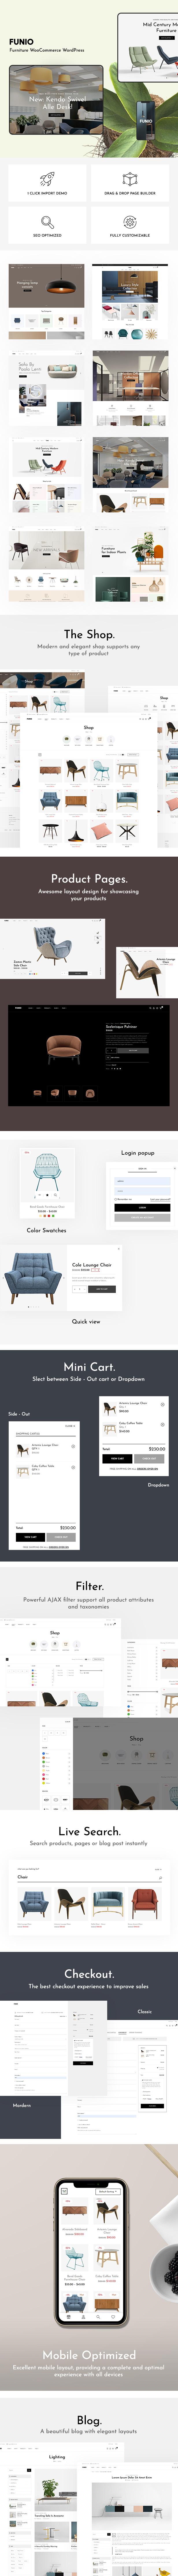 Funio - Möbel WooCommerce WordPress Theme - 1